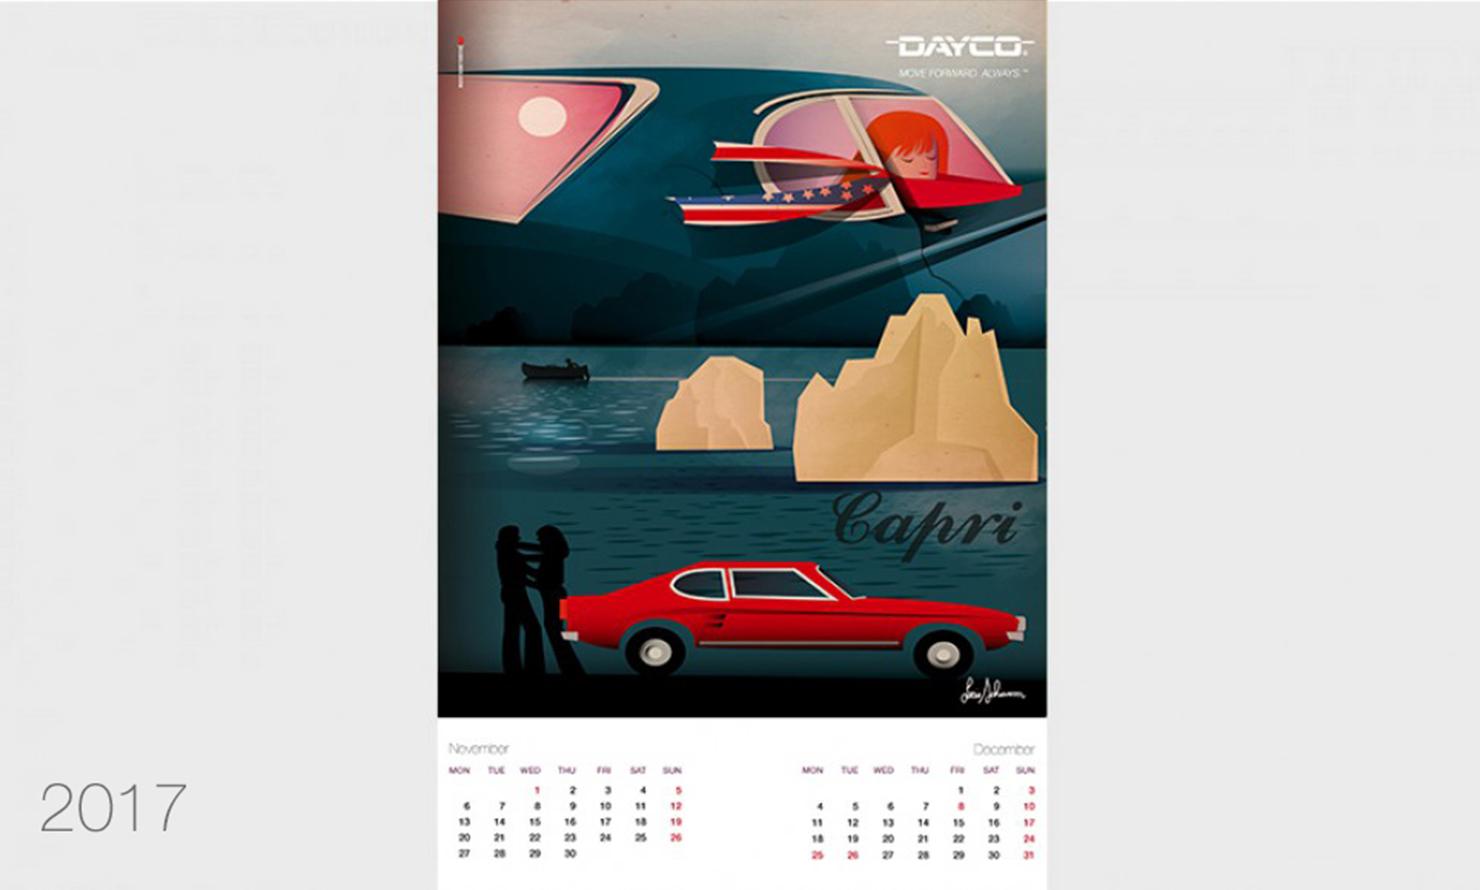 https://www.kubelibre.com/uploads/Slider-work-tutti-clienti/dayco-calendario-2017-6.jpg